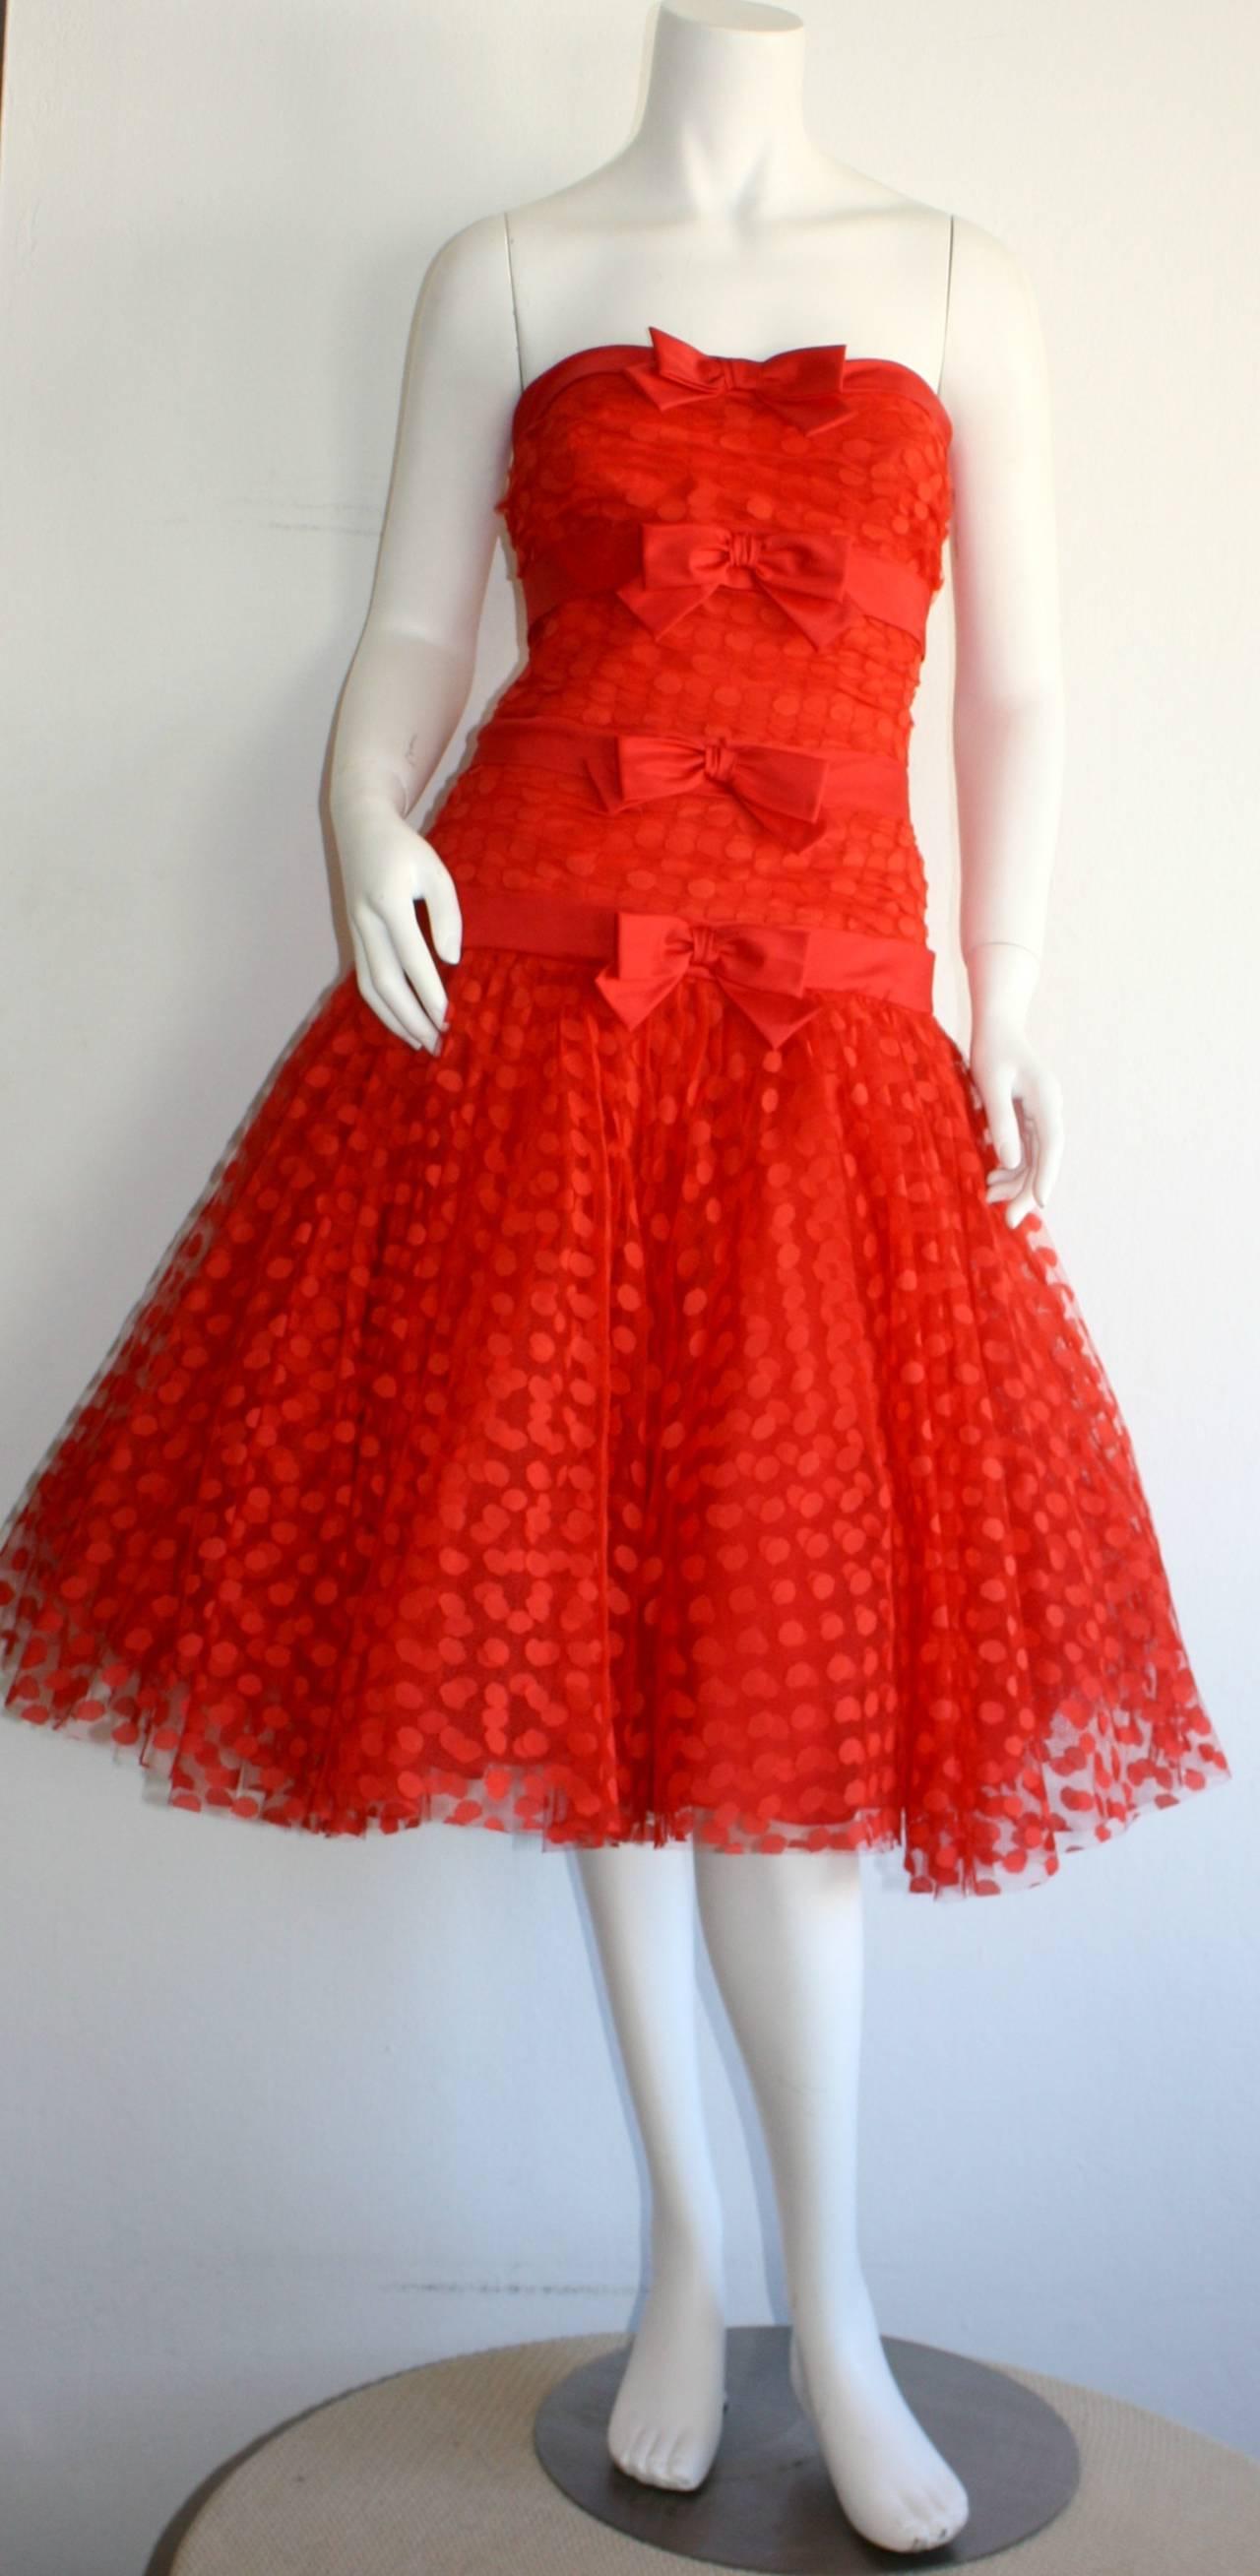 Incredible Vintage Jill Richards for Elizabeth Arden Red Valentine's Day Dress 2